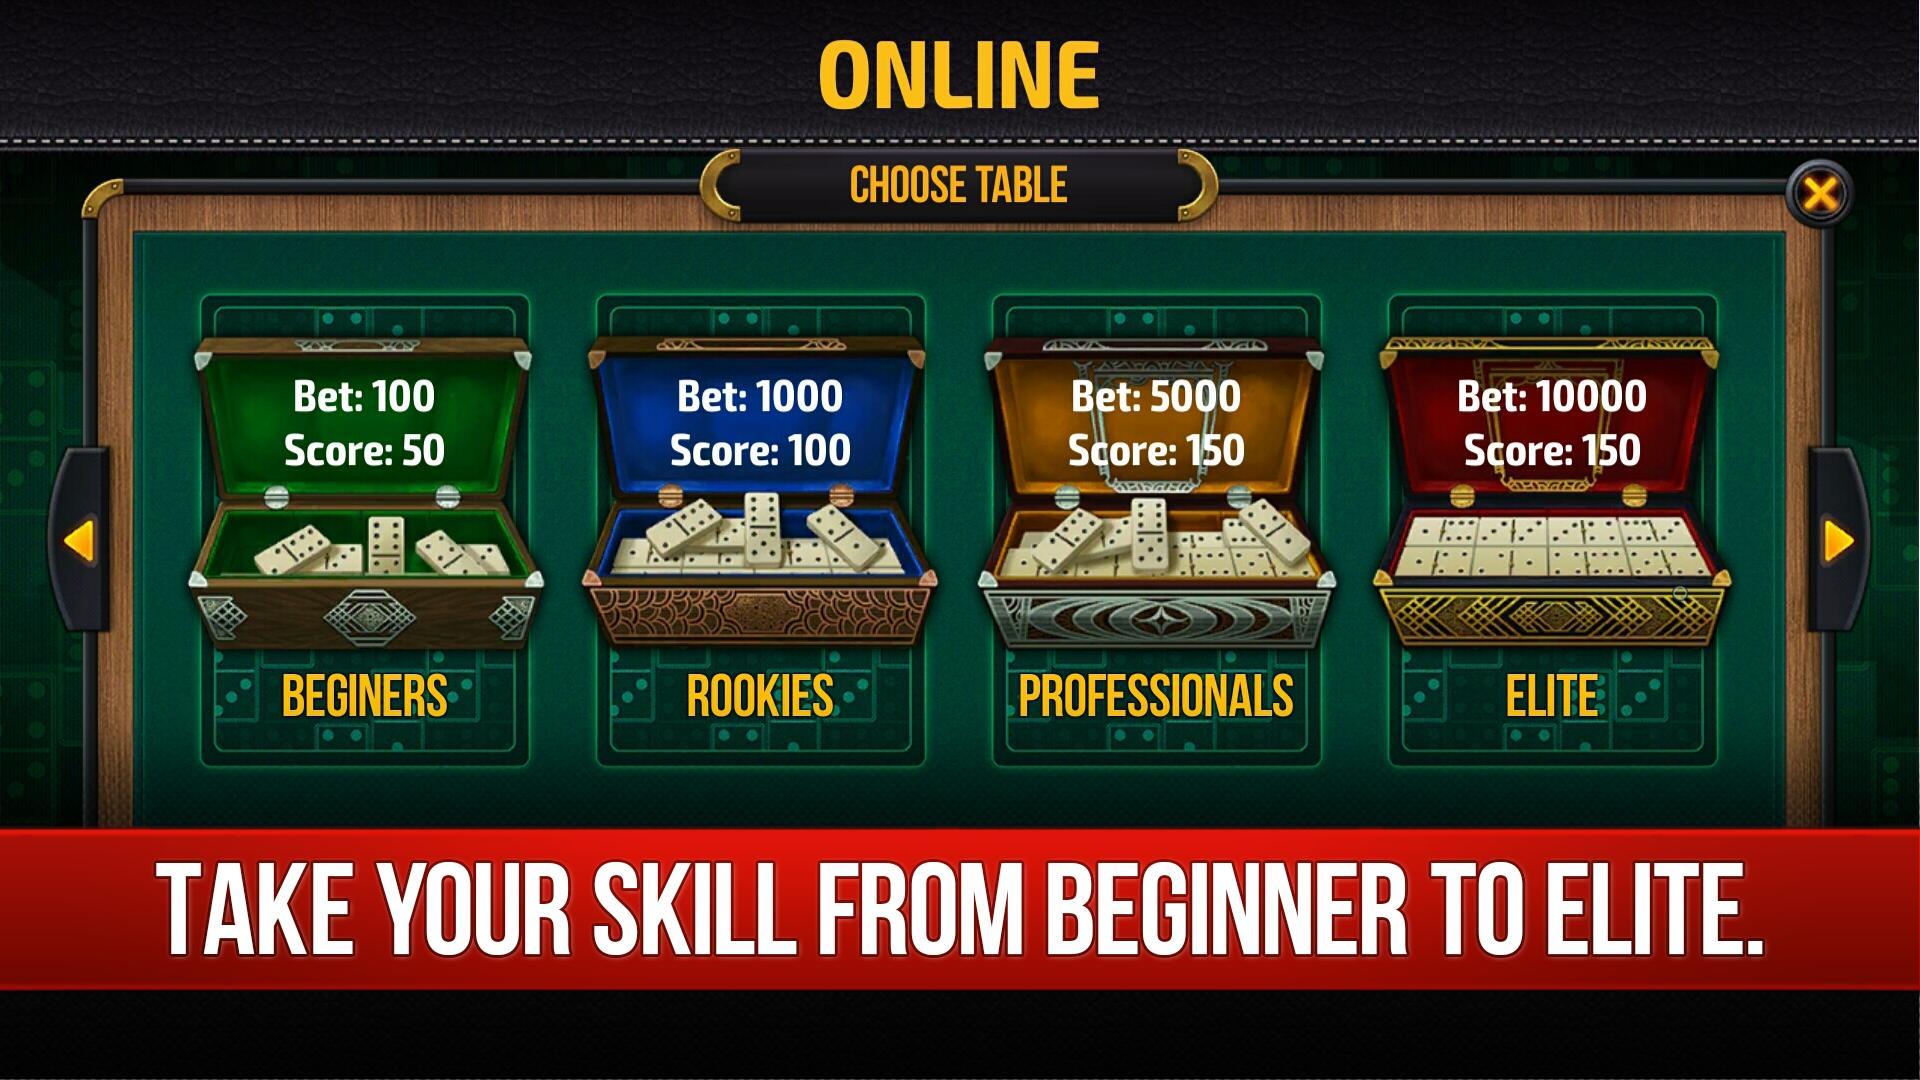 Domino - Dominoes online. Play free Dominos! 2.9.2 Screenshot 15